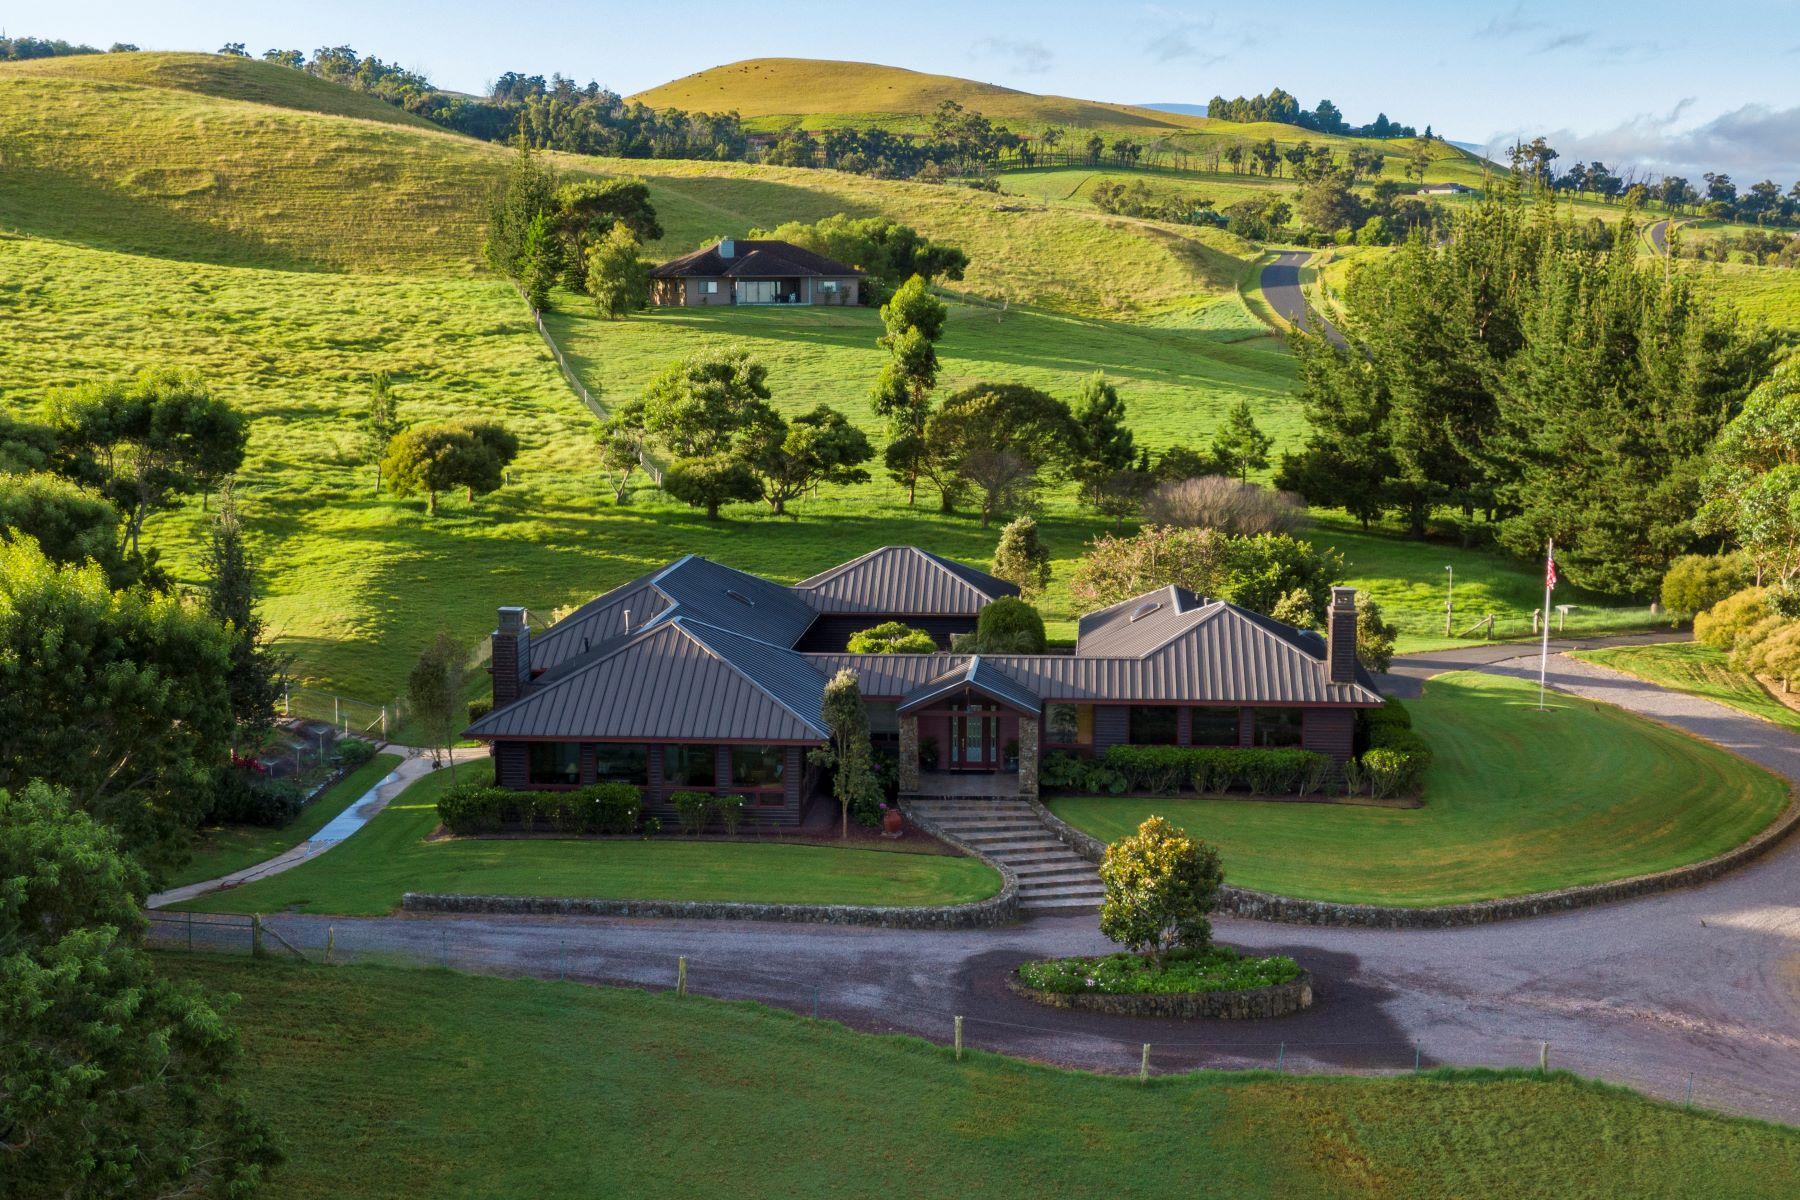 Single Family Homes för Försäljning vid 67-1117 North Alulike Road, Waimea, HI 96743 Waimea, Hawaii 96743 Förenta staterna